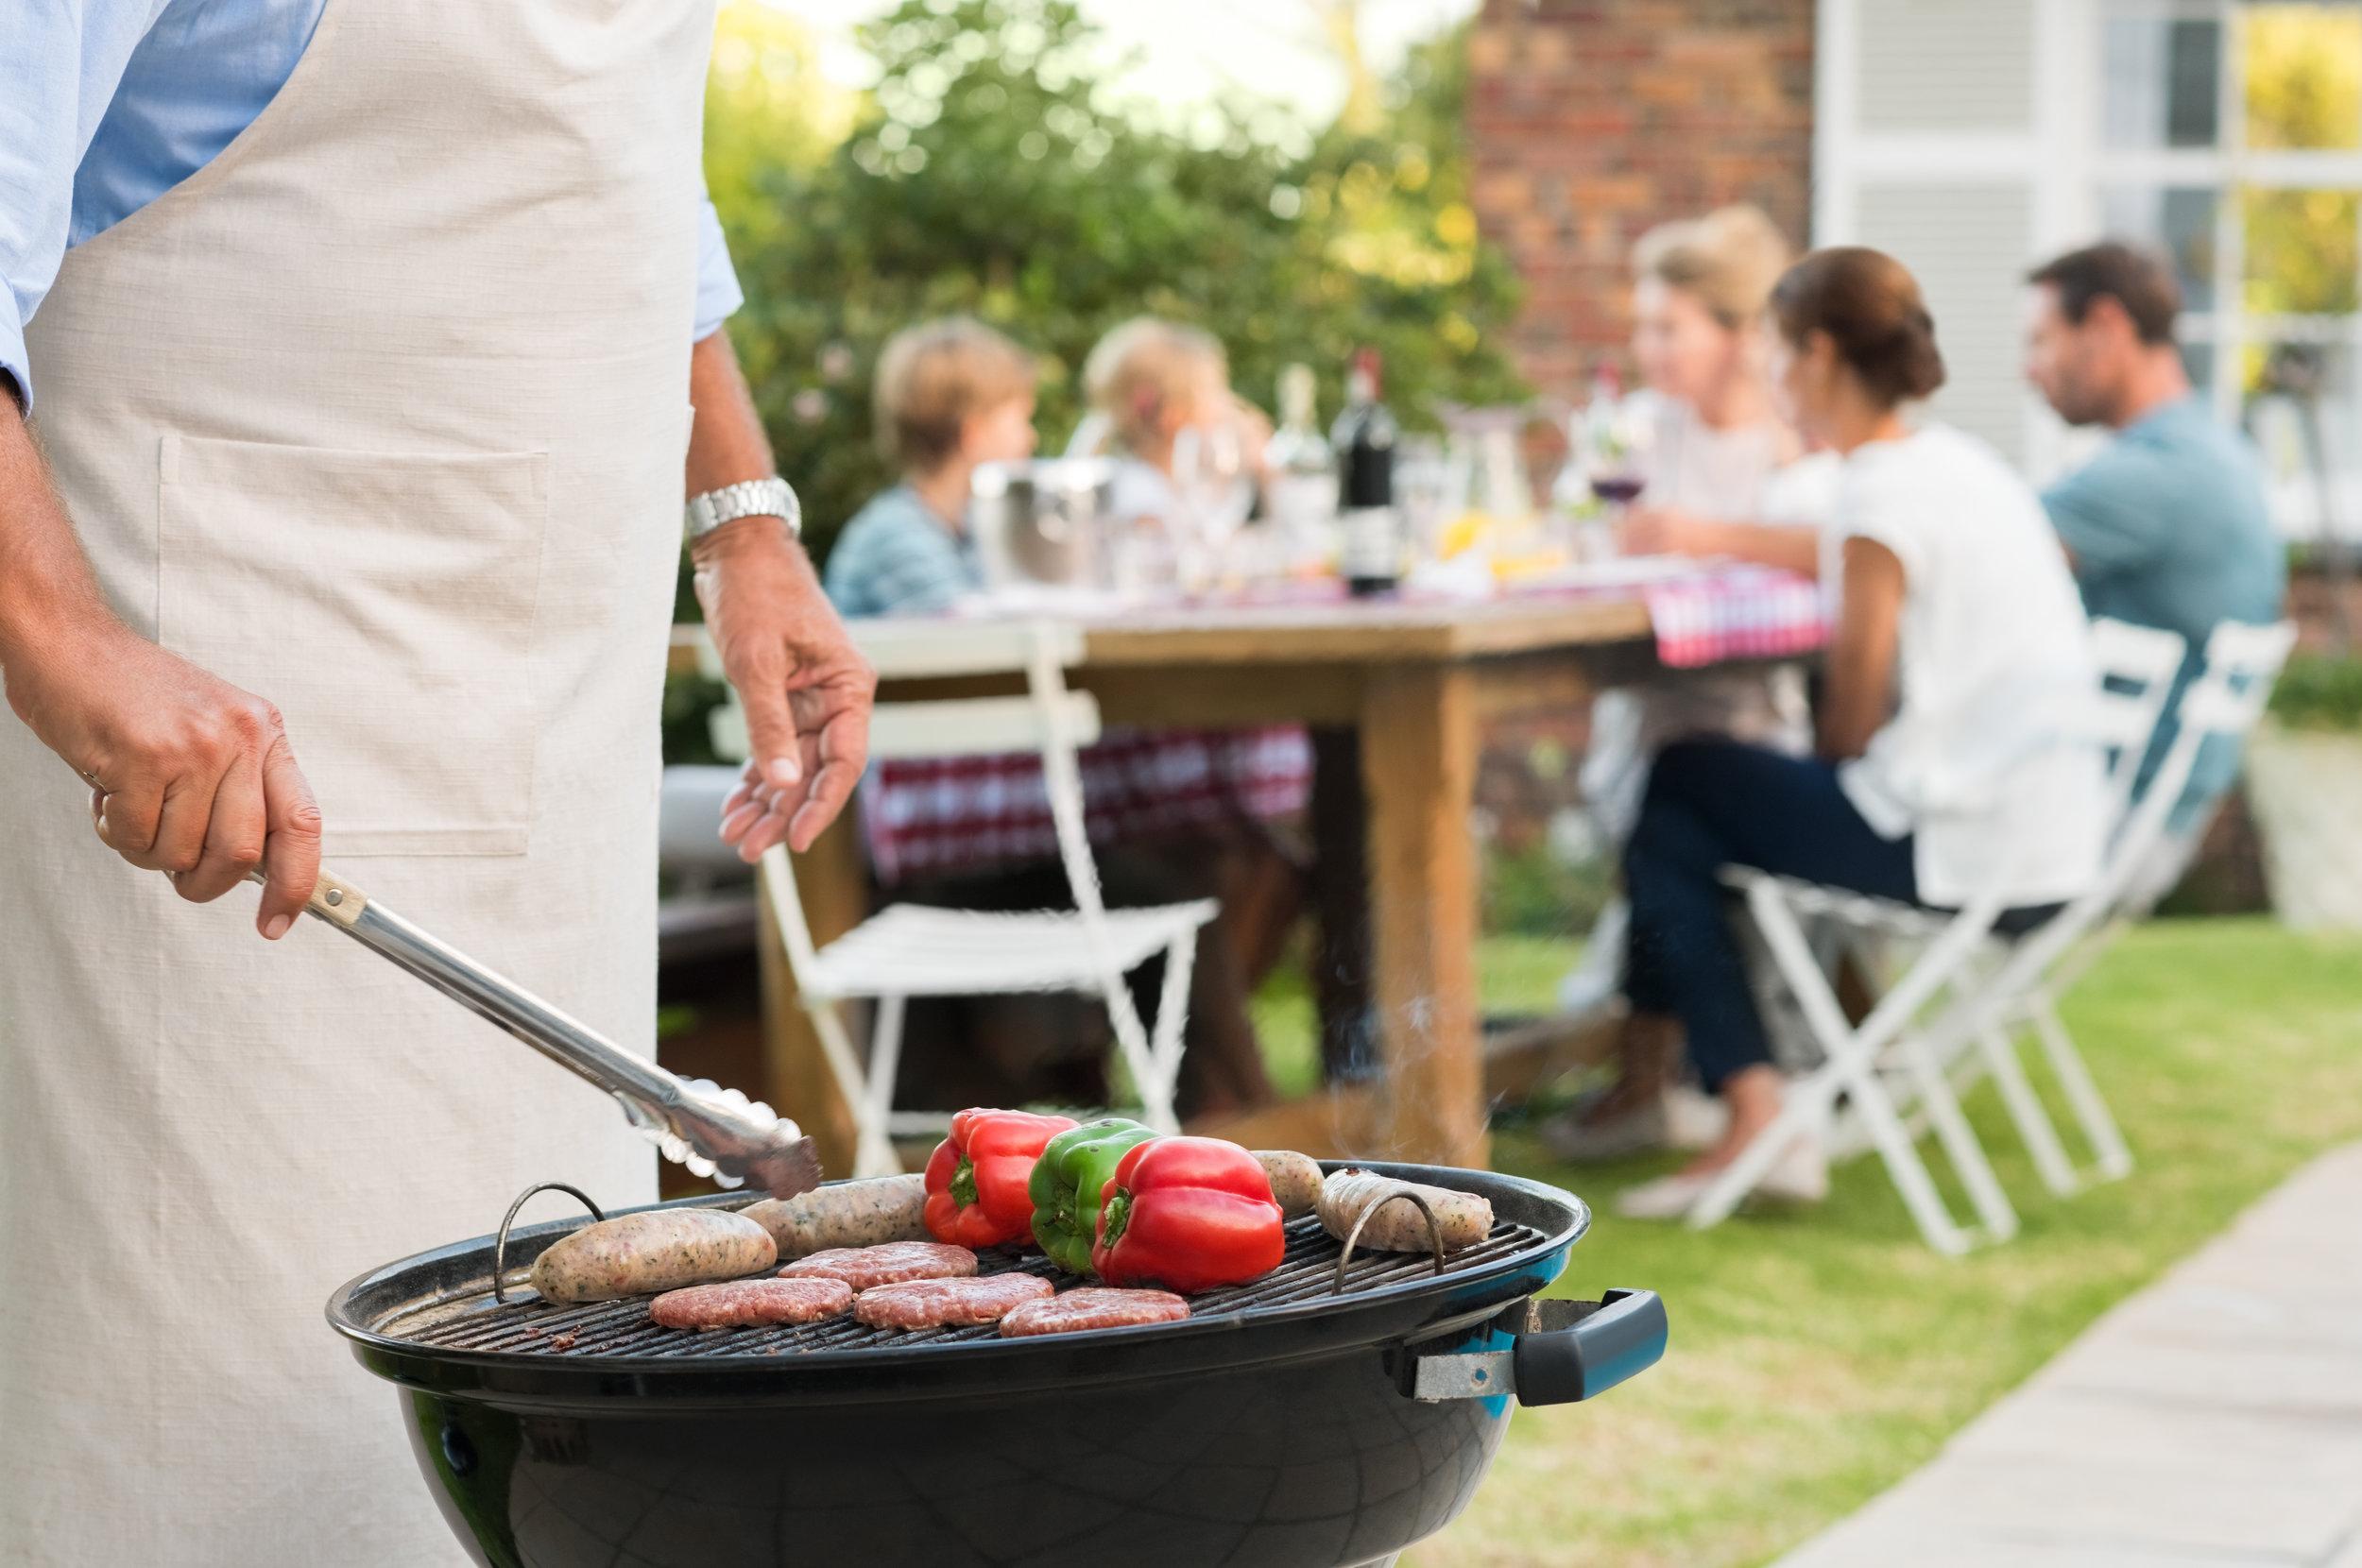 Vine Ripe's Backyard BBq - Click here to see our Backyard BBQ Menu.